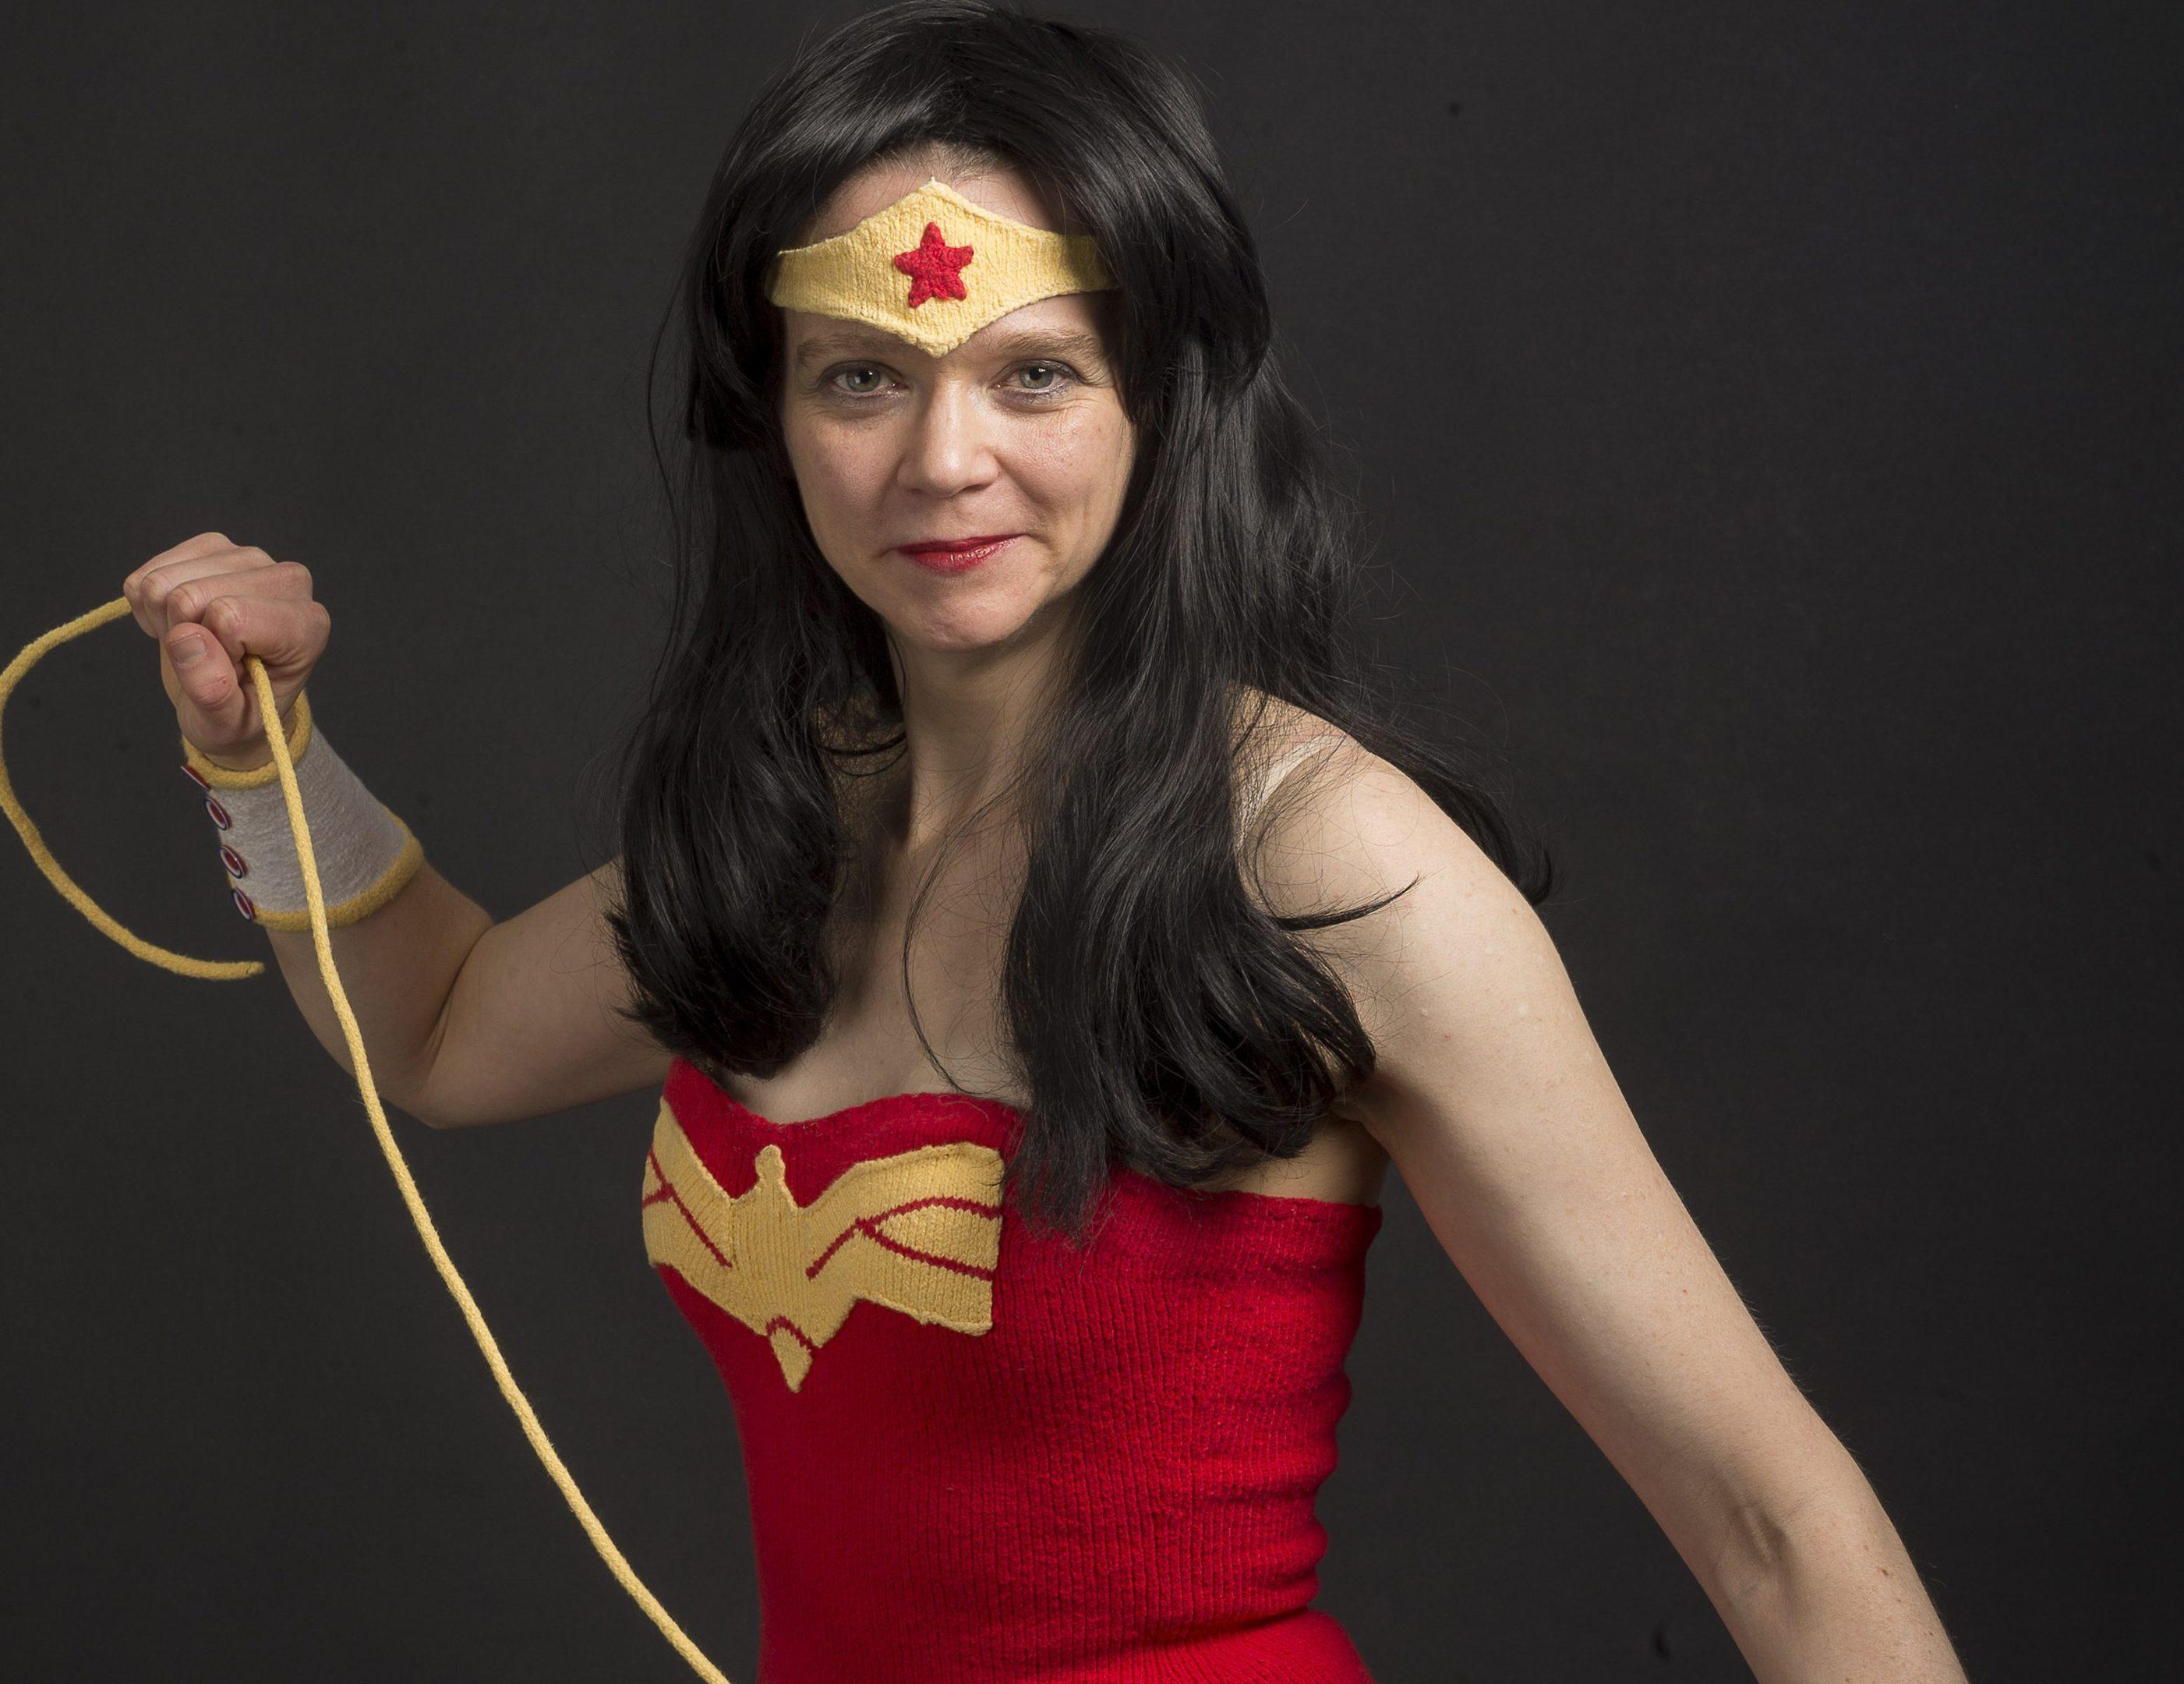 Victoria Noad from Aberdeen who knits super hero costumes. (DEREK IRONSIDE / NEWSLINE MEDIA)